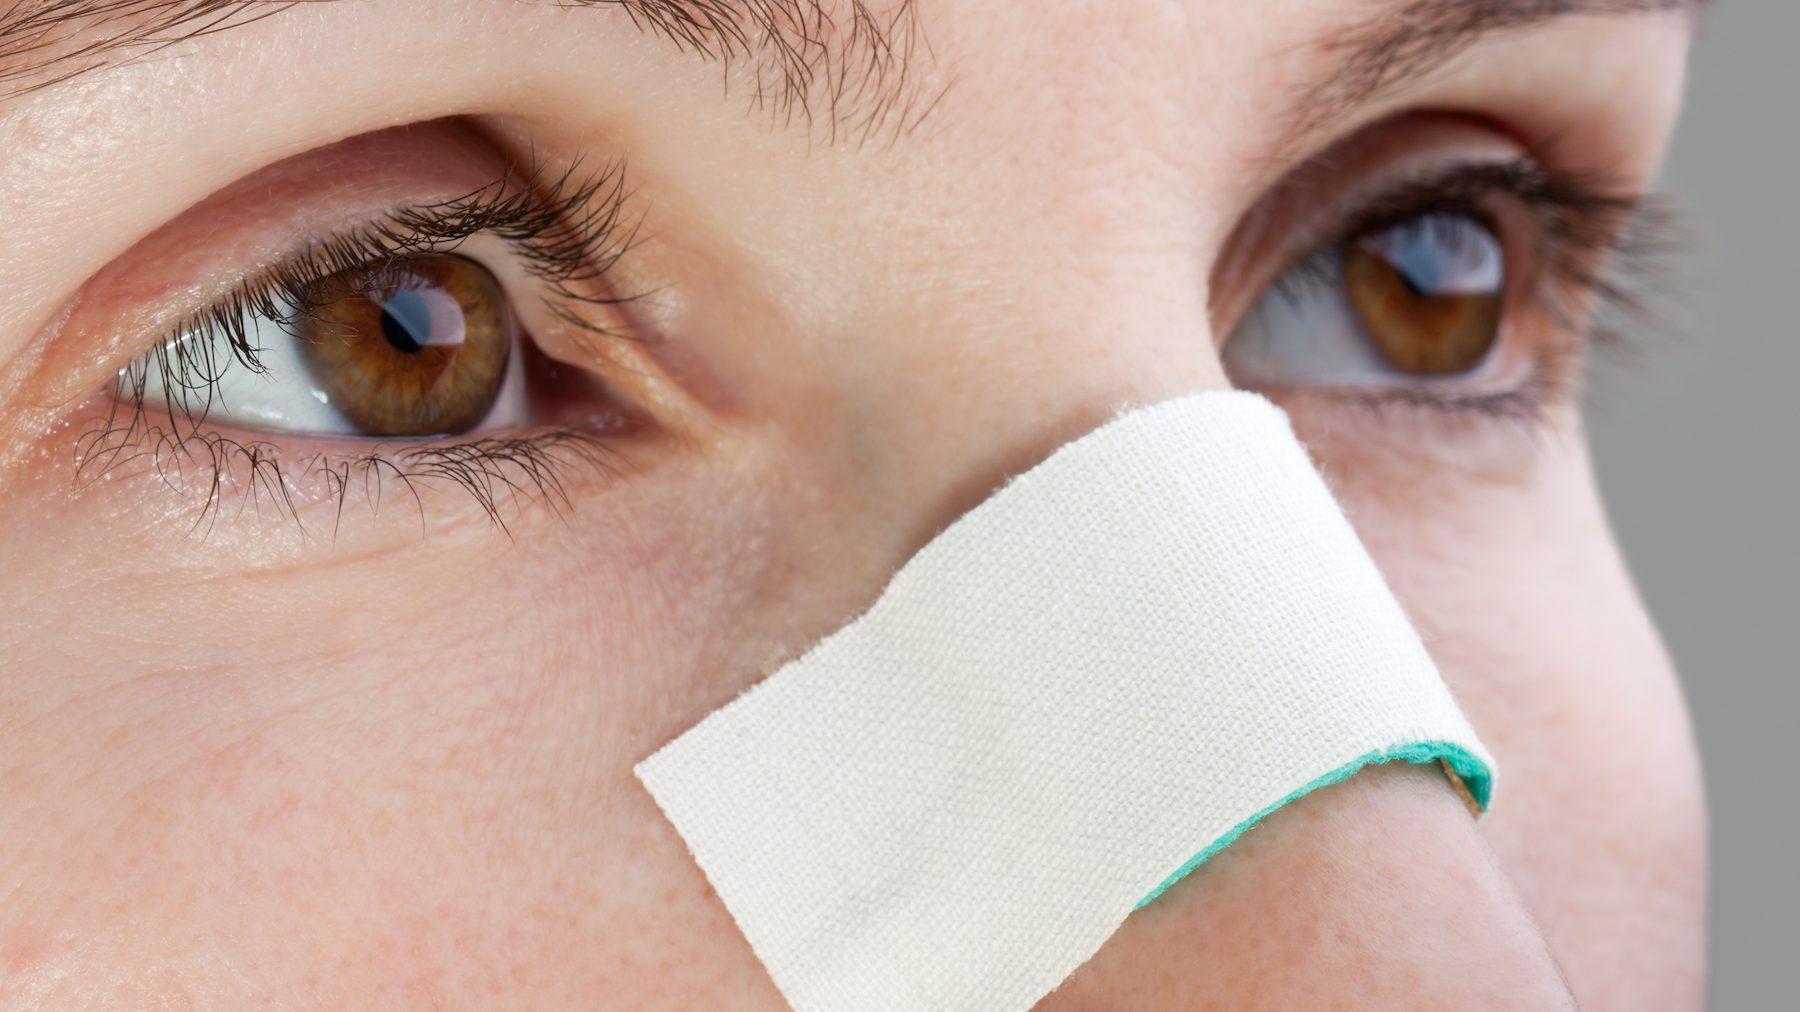 چرا بعد از عمل جراحی بینی چسب میزنیم؟